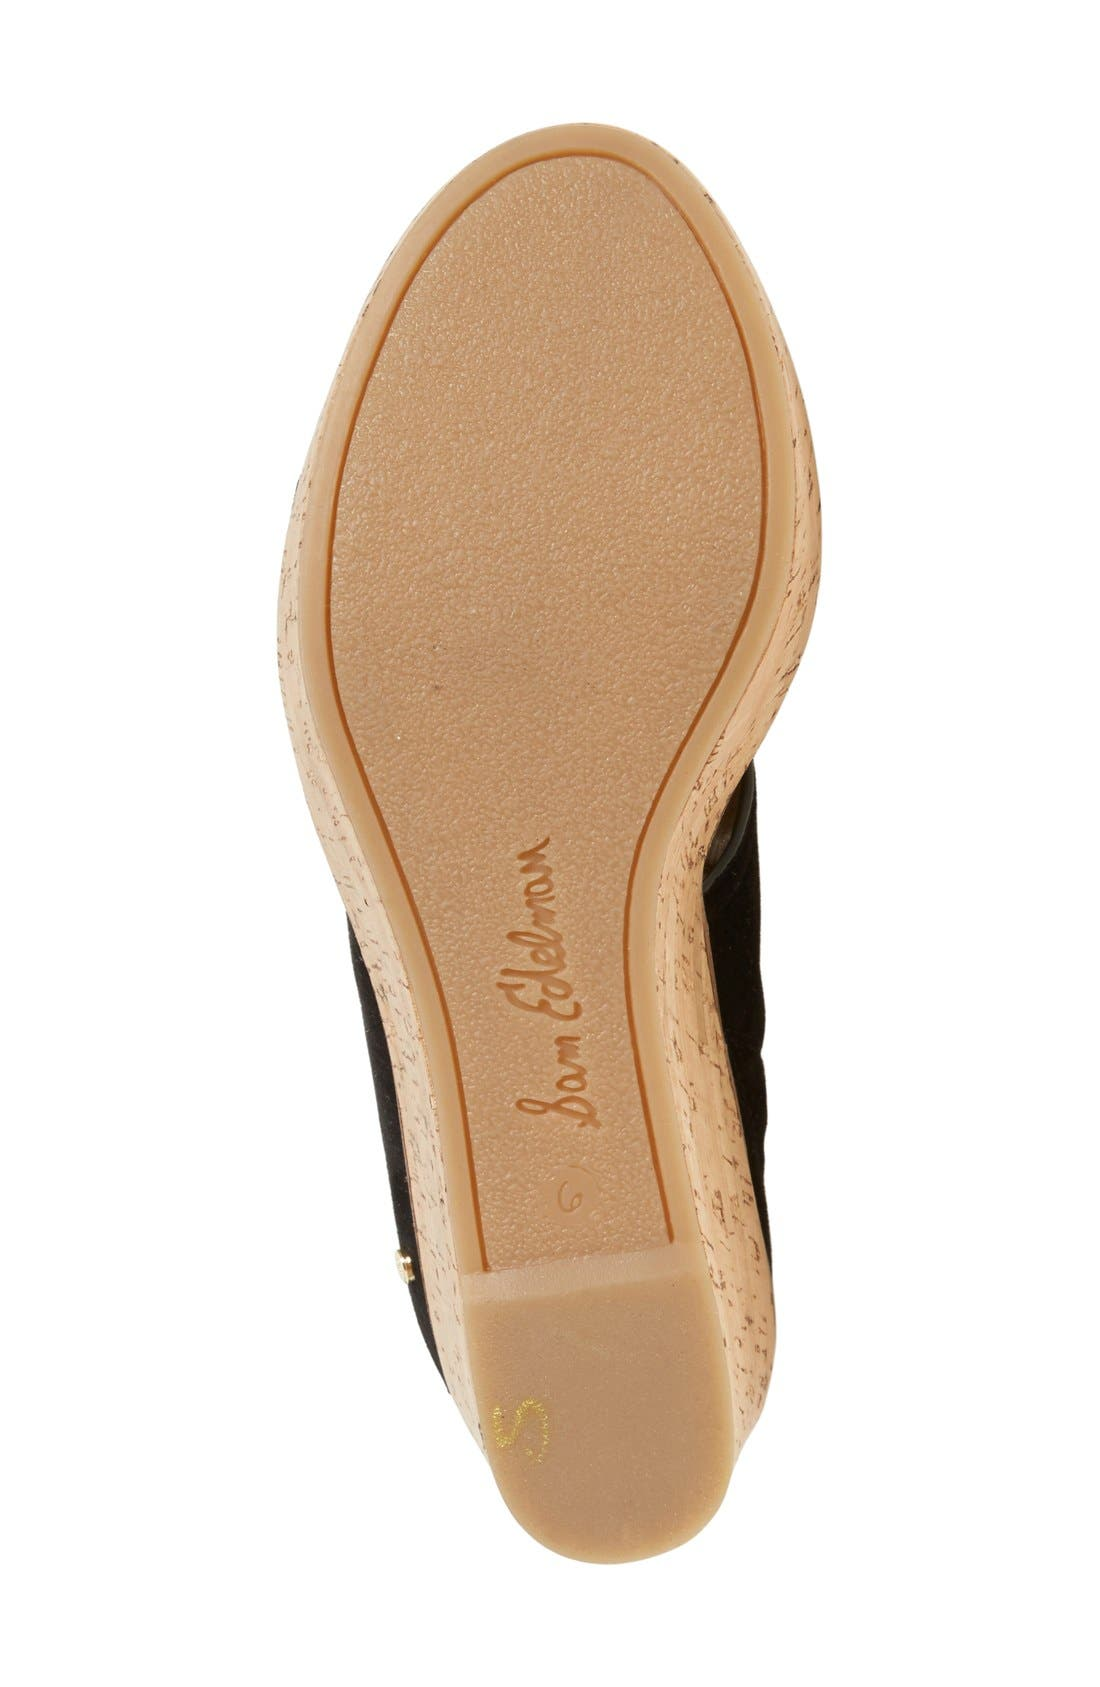 'Dali' Wedge Sandal,                             Alternate thumbnail 4, color,                             Black Suede